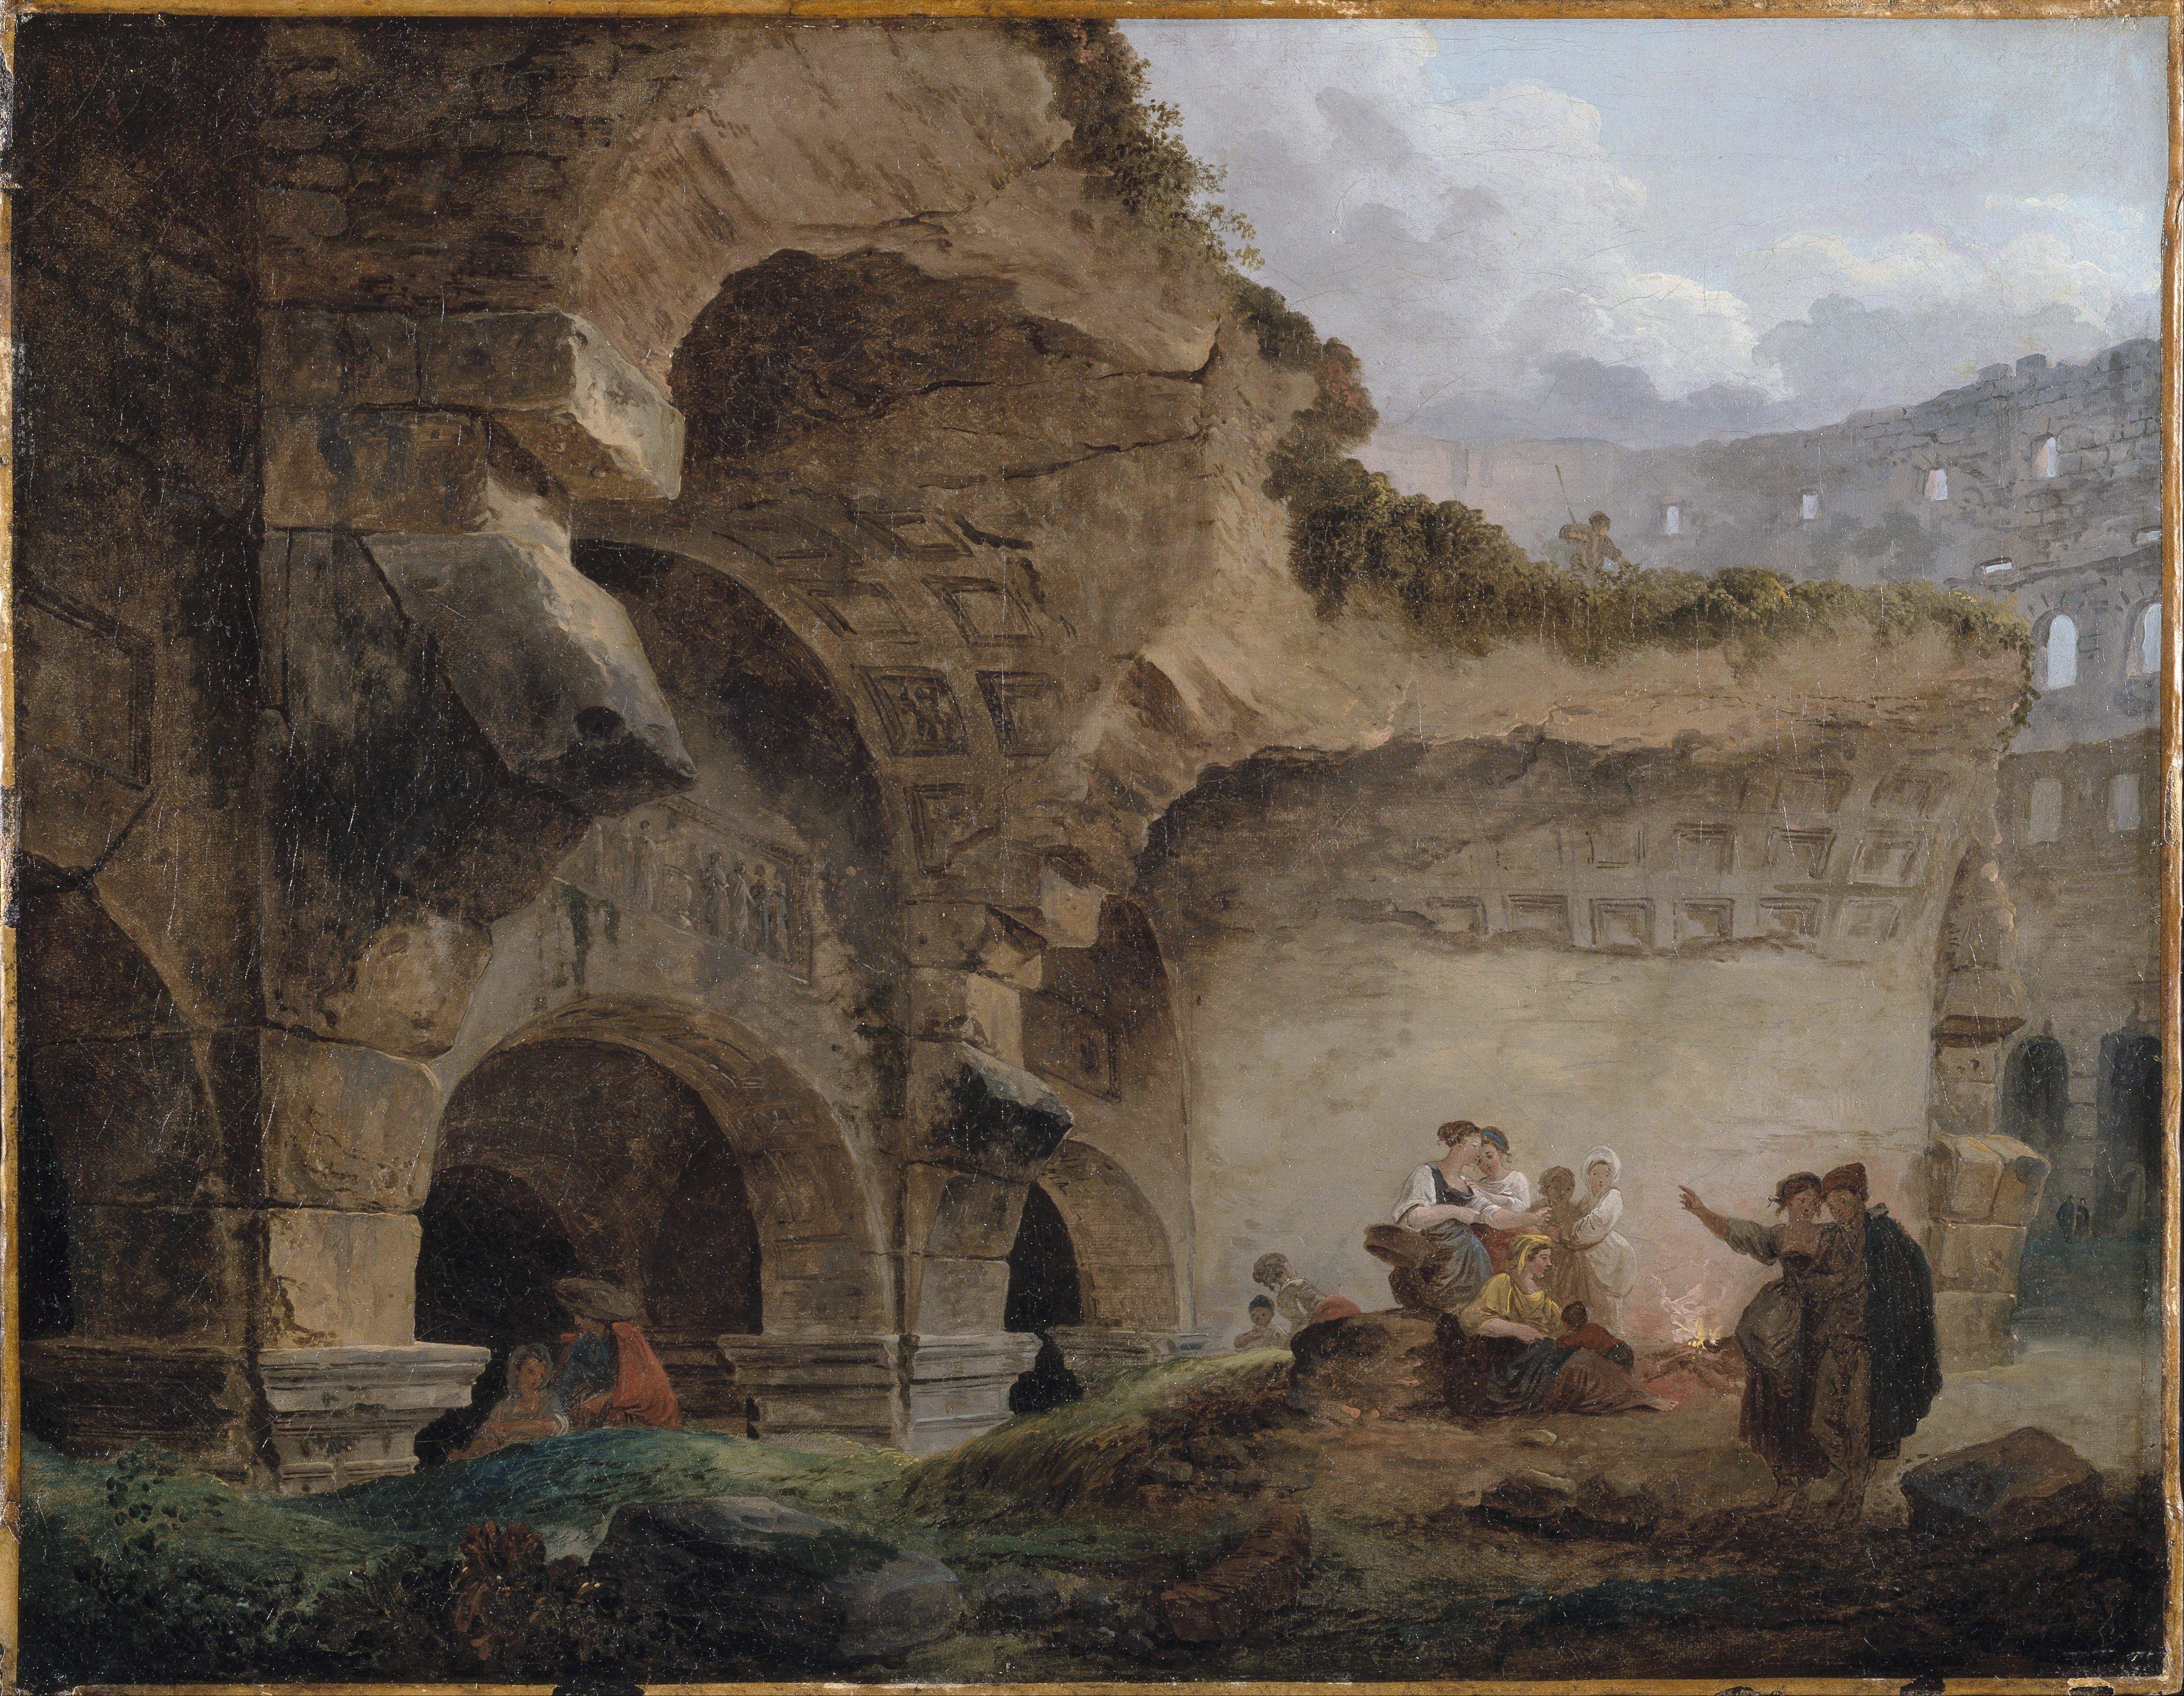 Art on the ruins 86